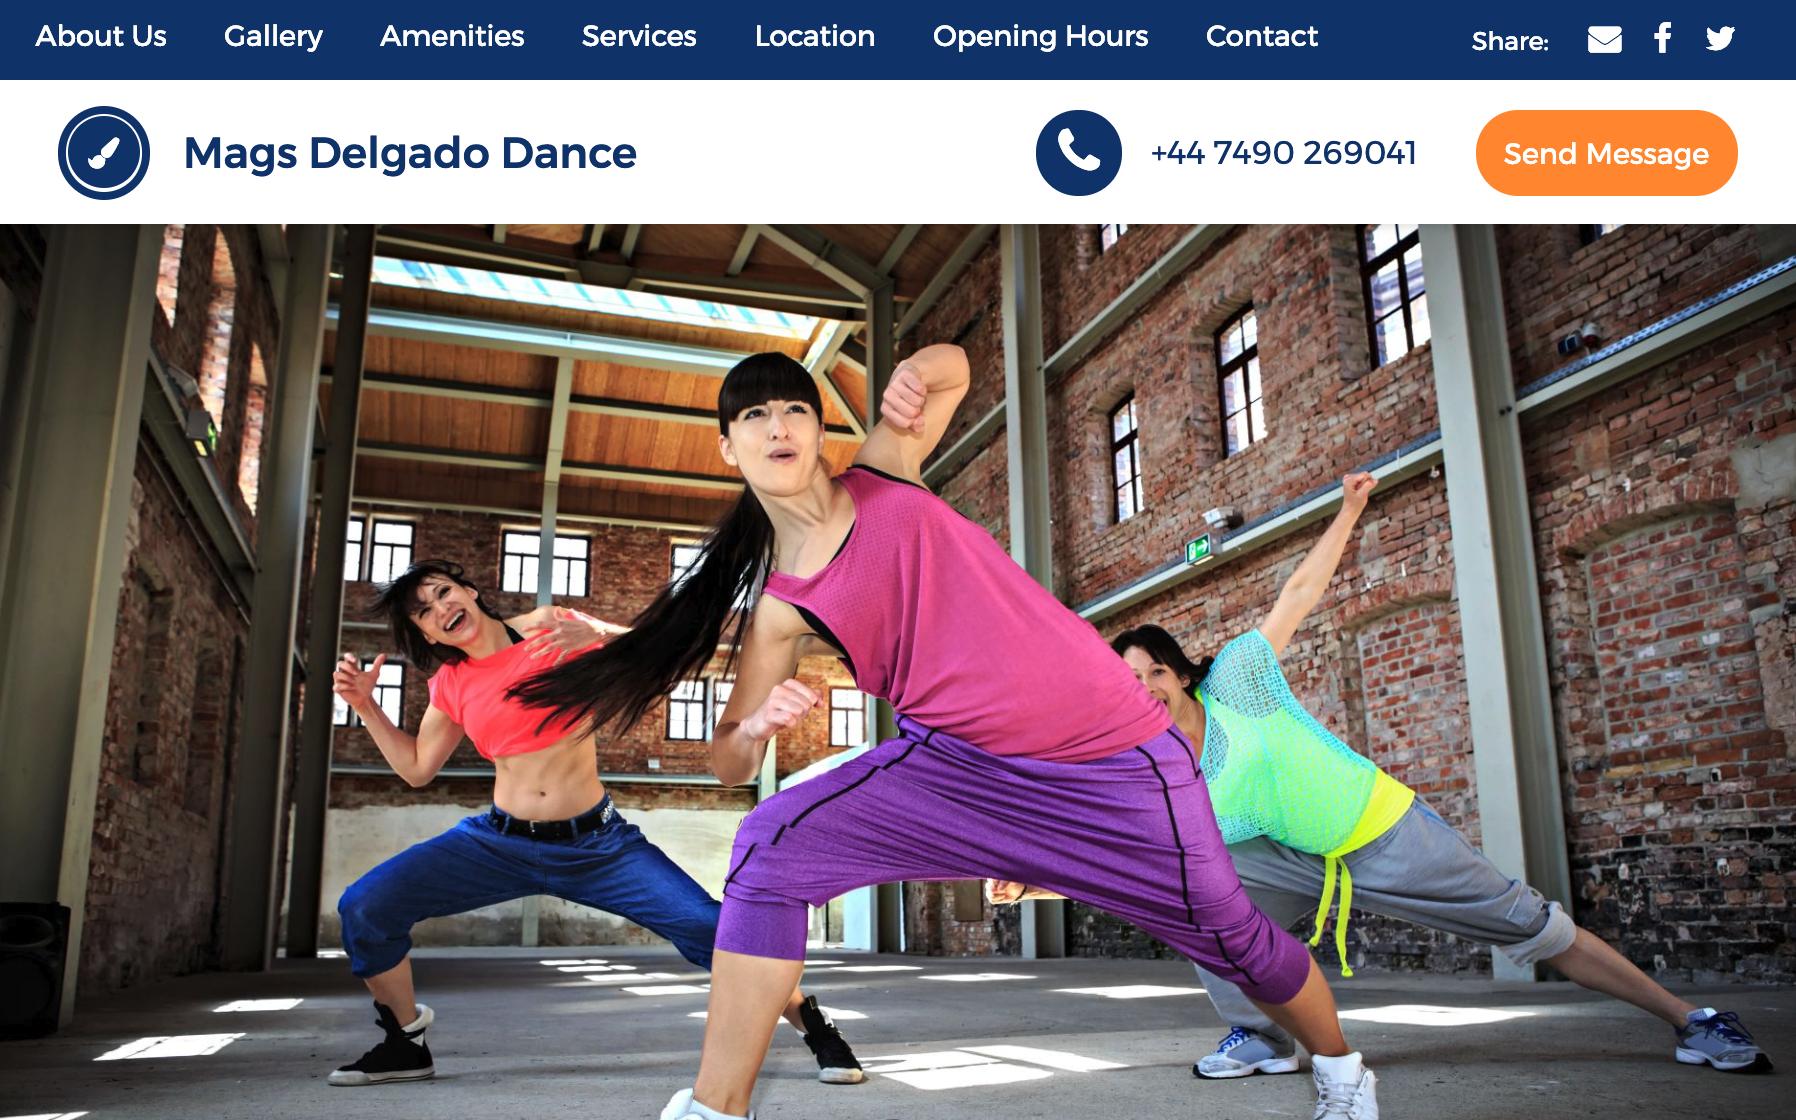 Mags Delgado Dance